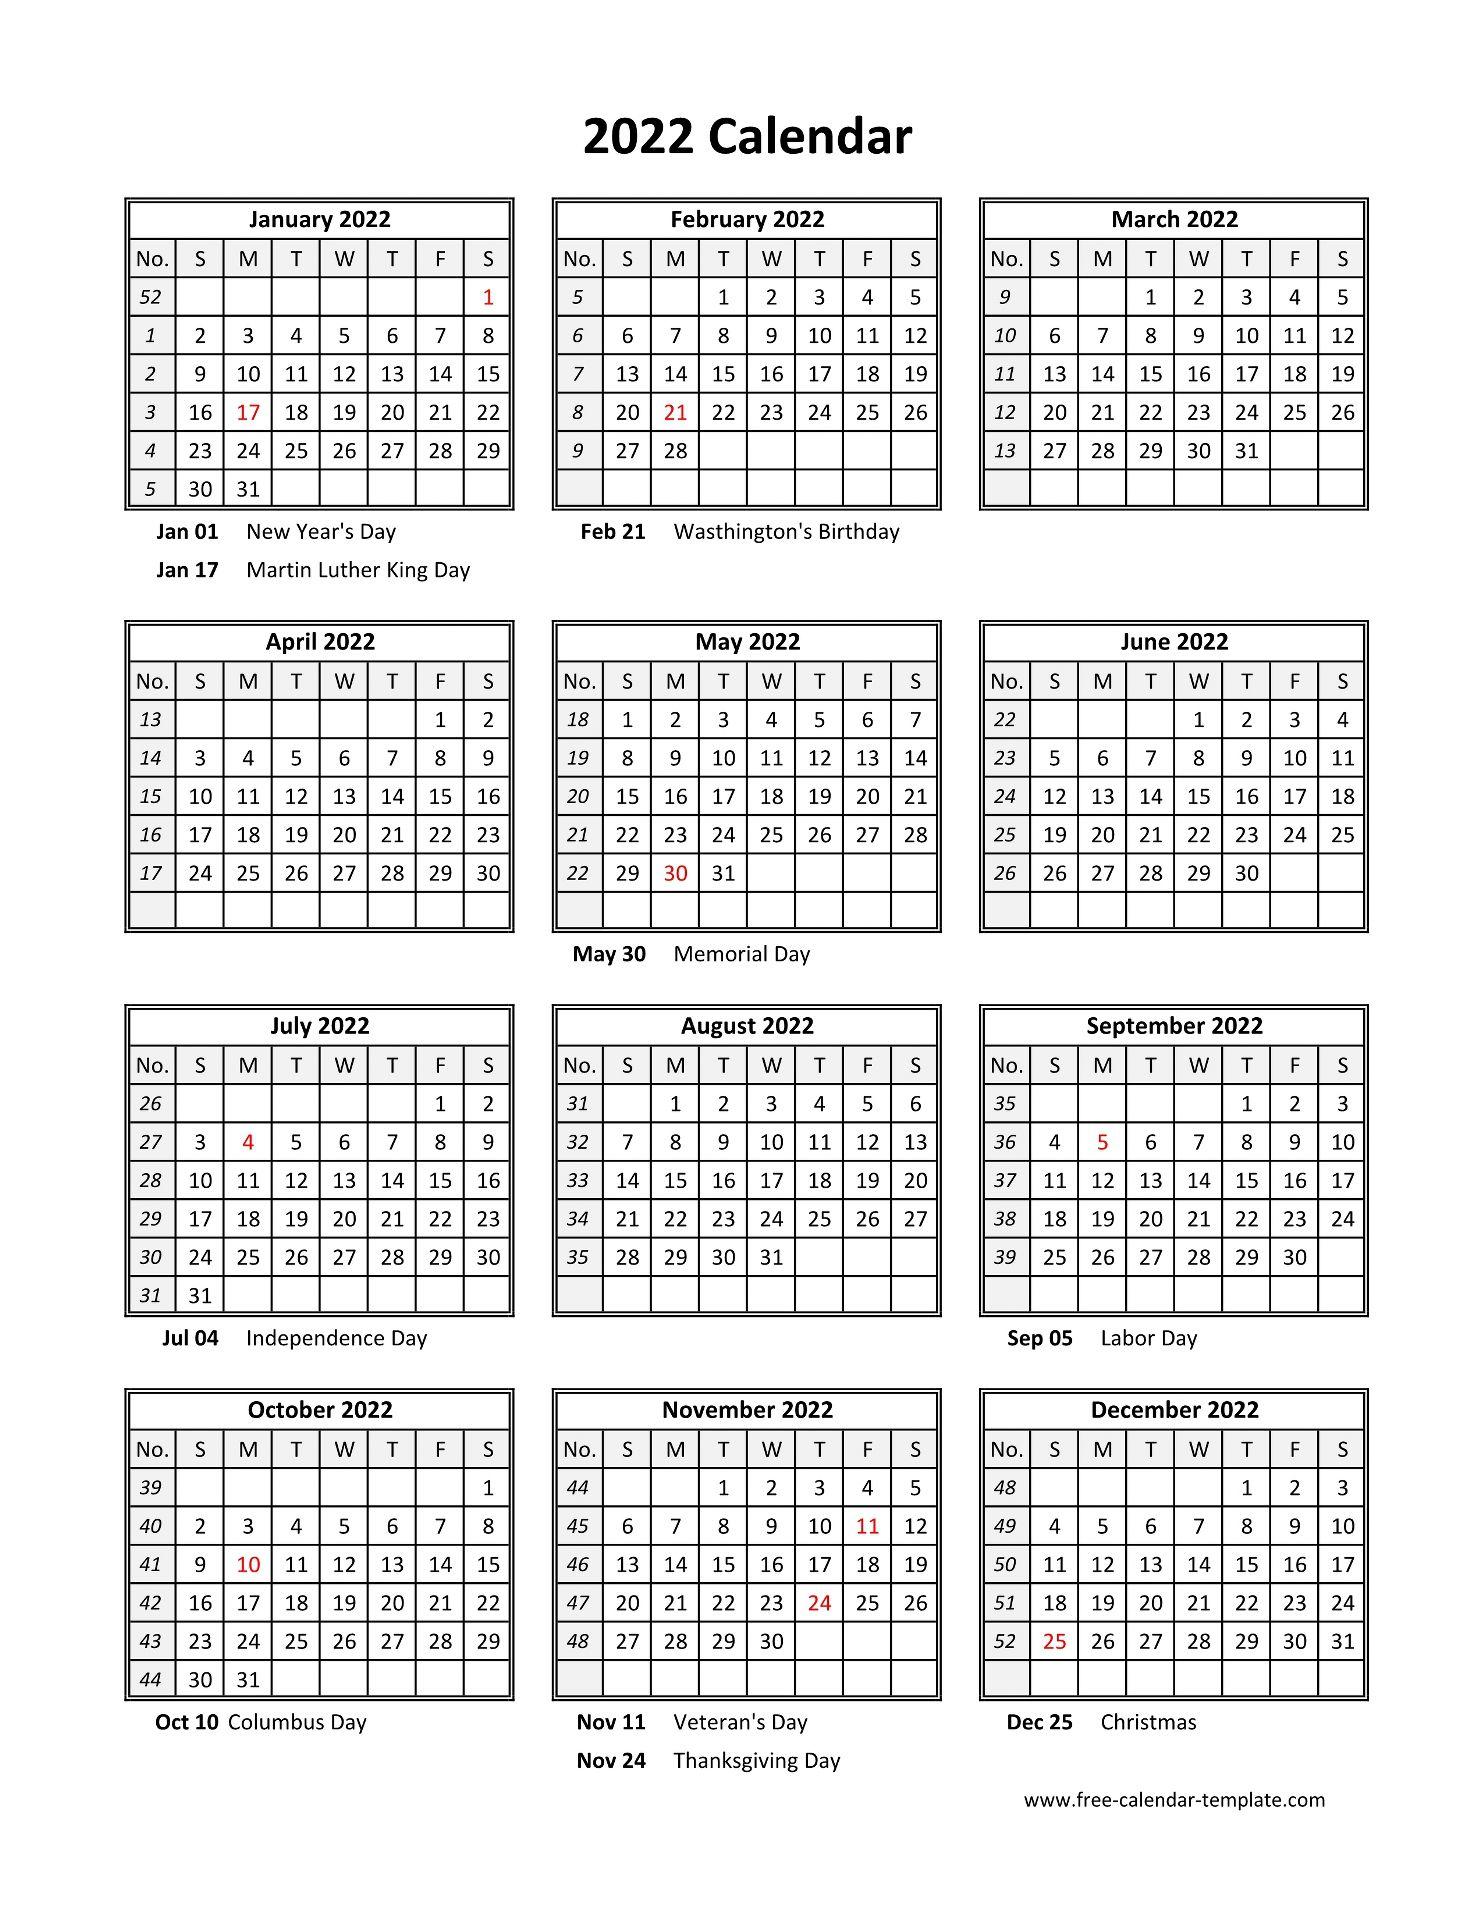 Vertical Calendar 2022.Yearly Printable Calendar 2022 With Holidays Free Calendar Template Com